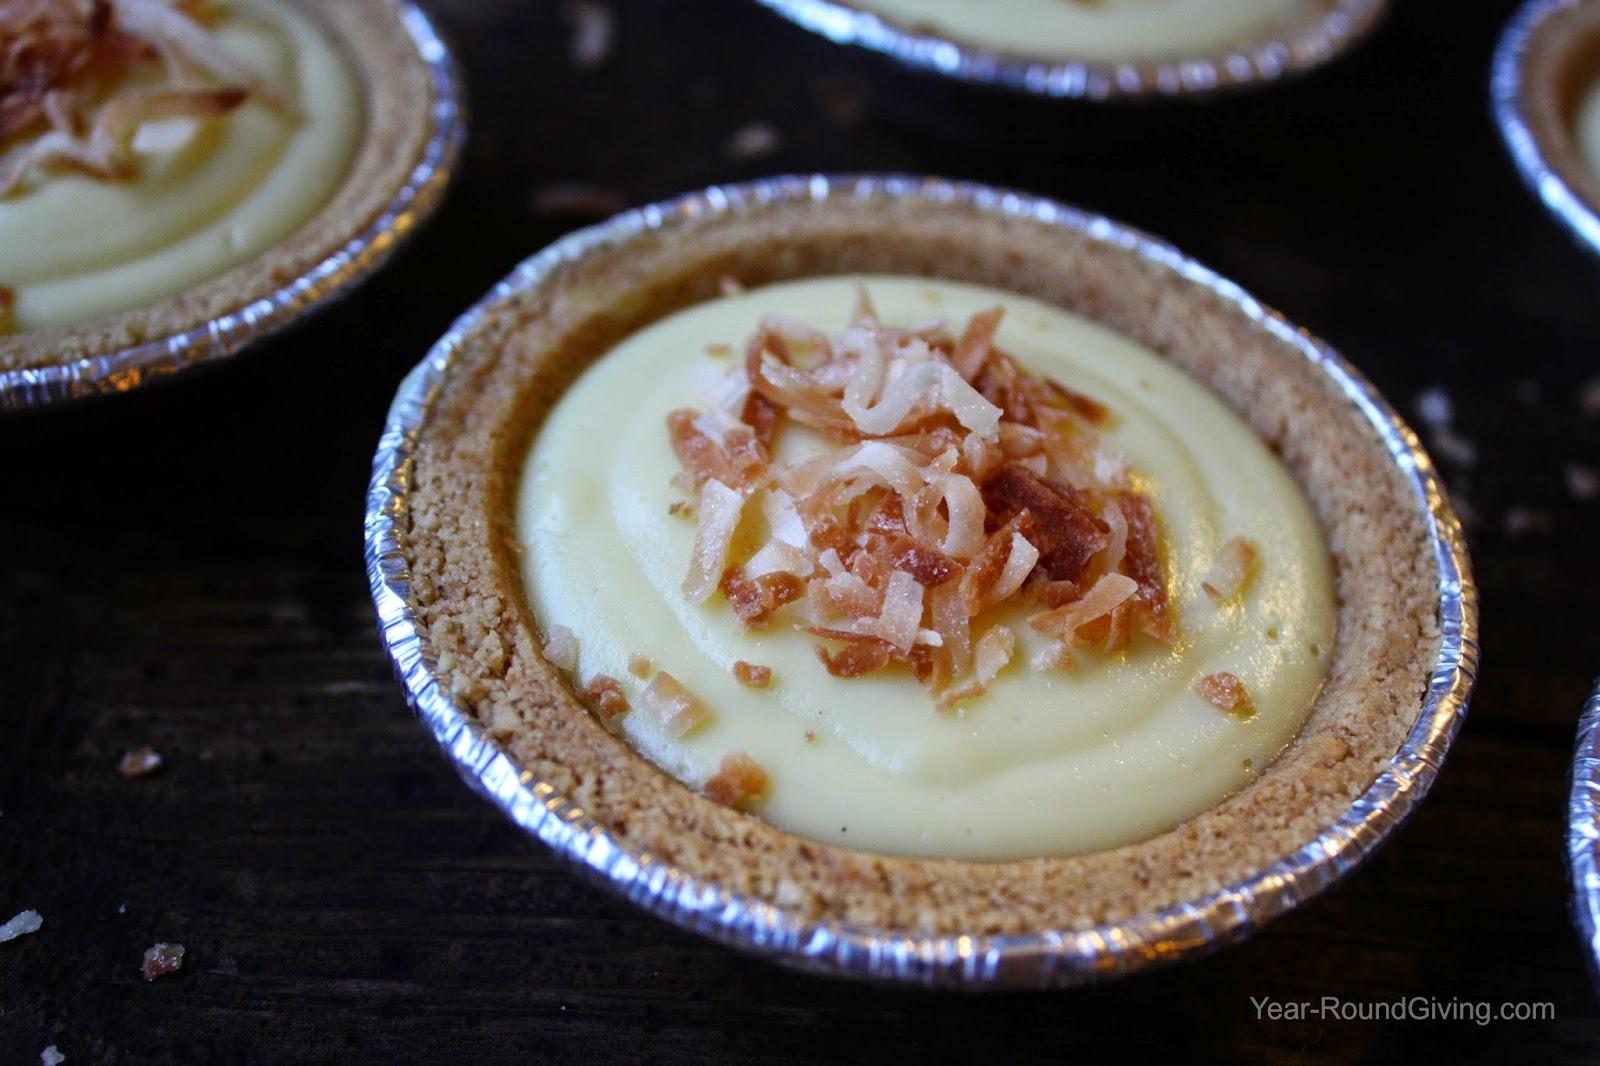 Coconut Cream Pudding - Daily Appetite